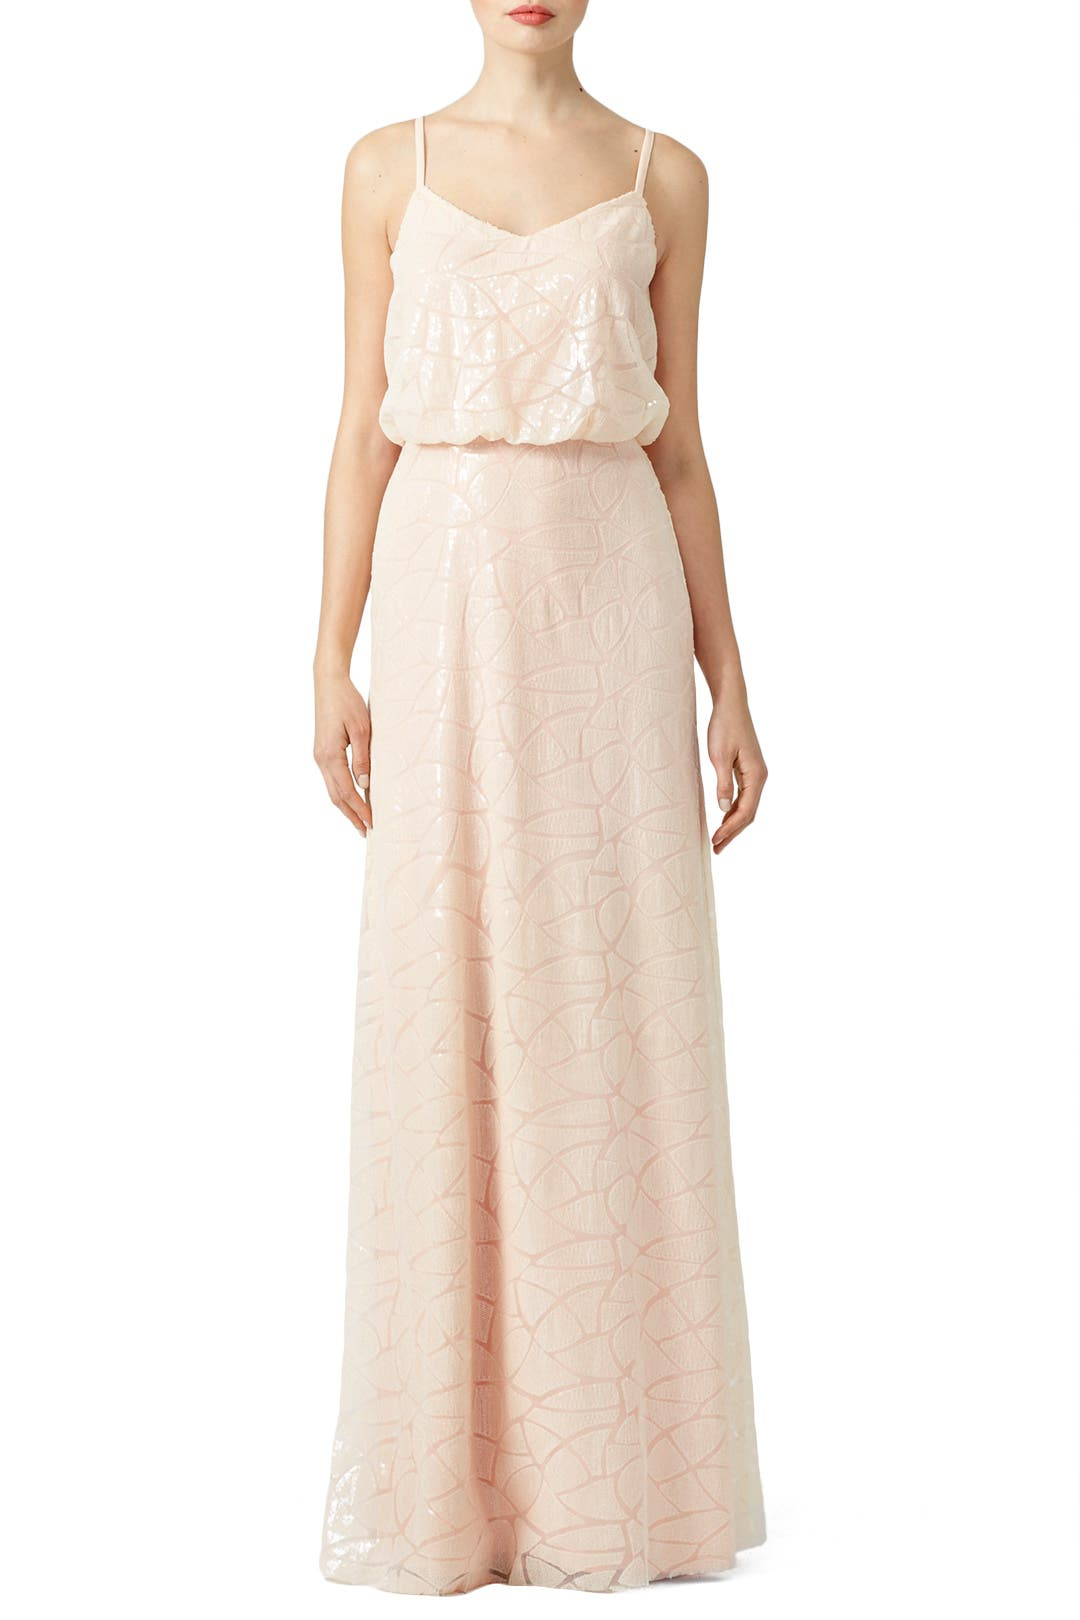 Slate Willow Dresses